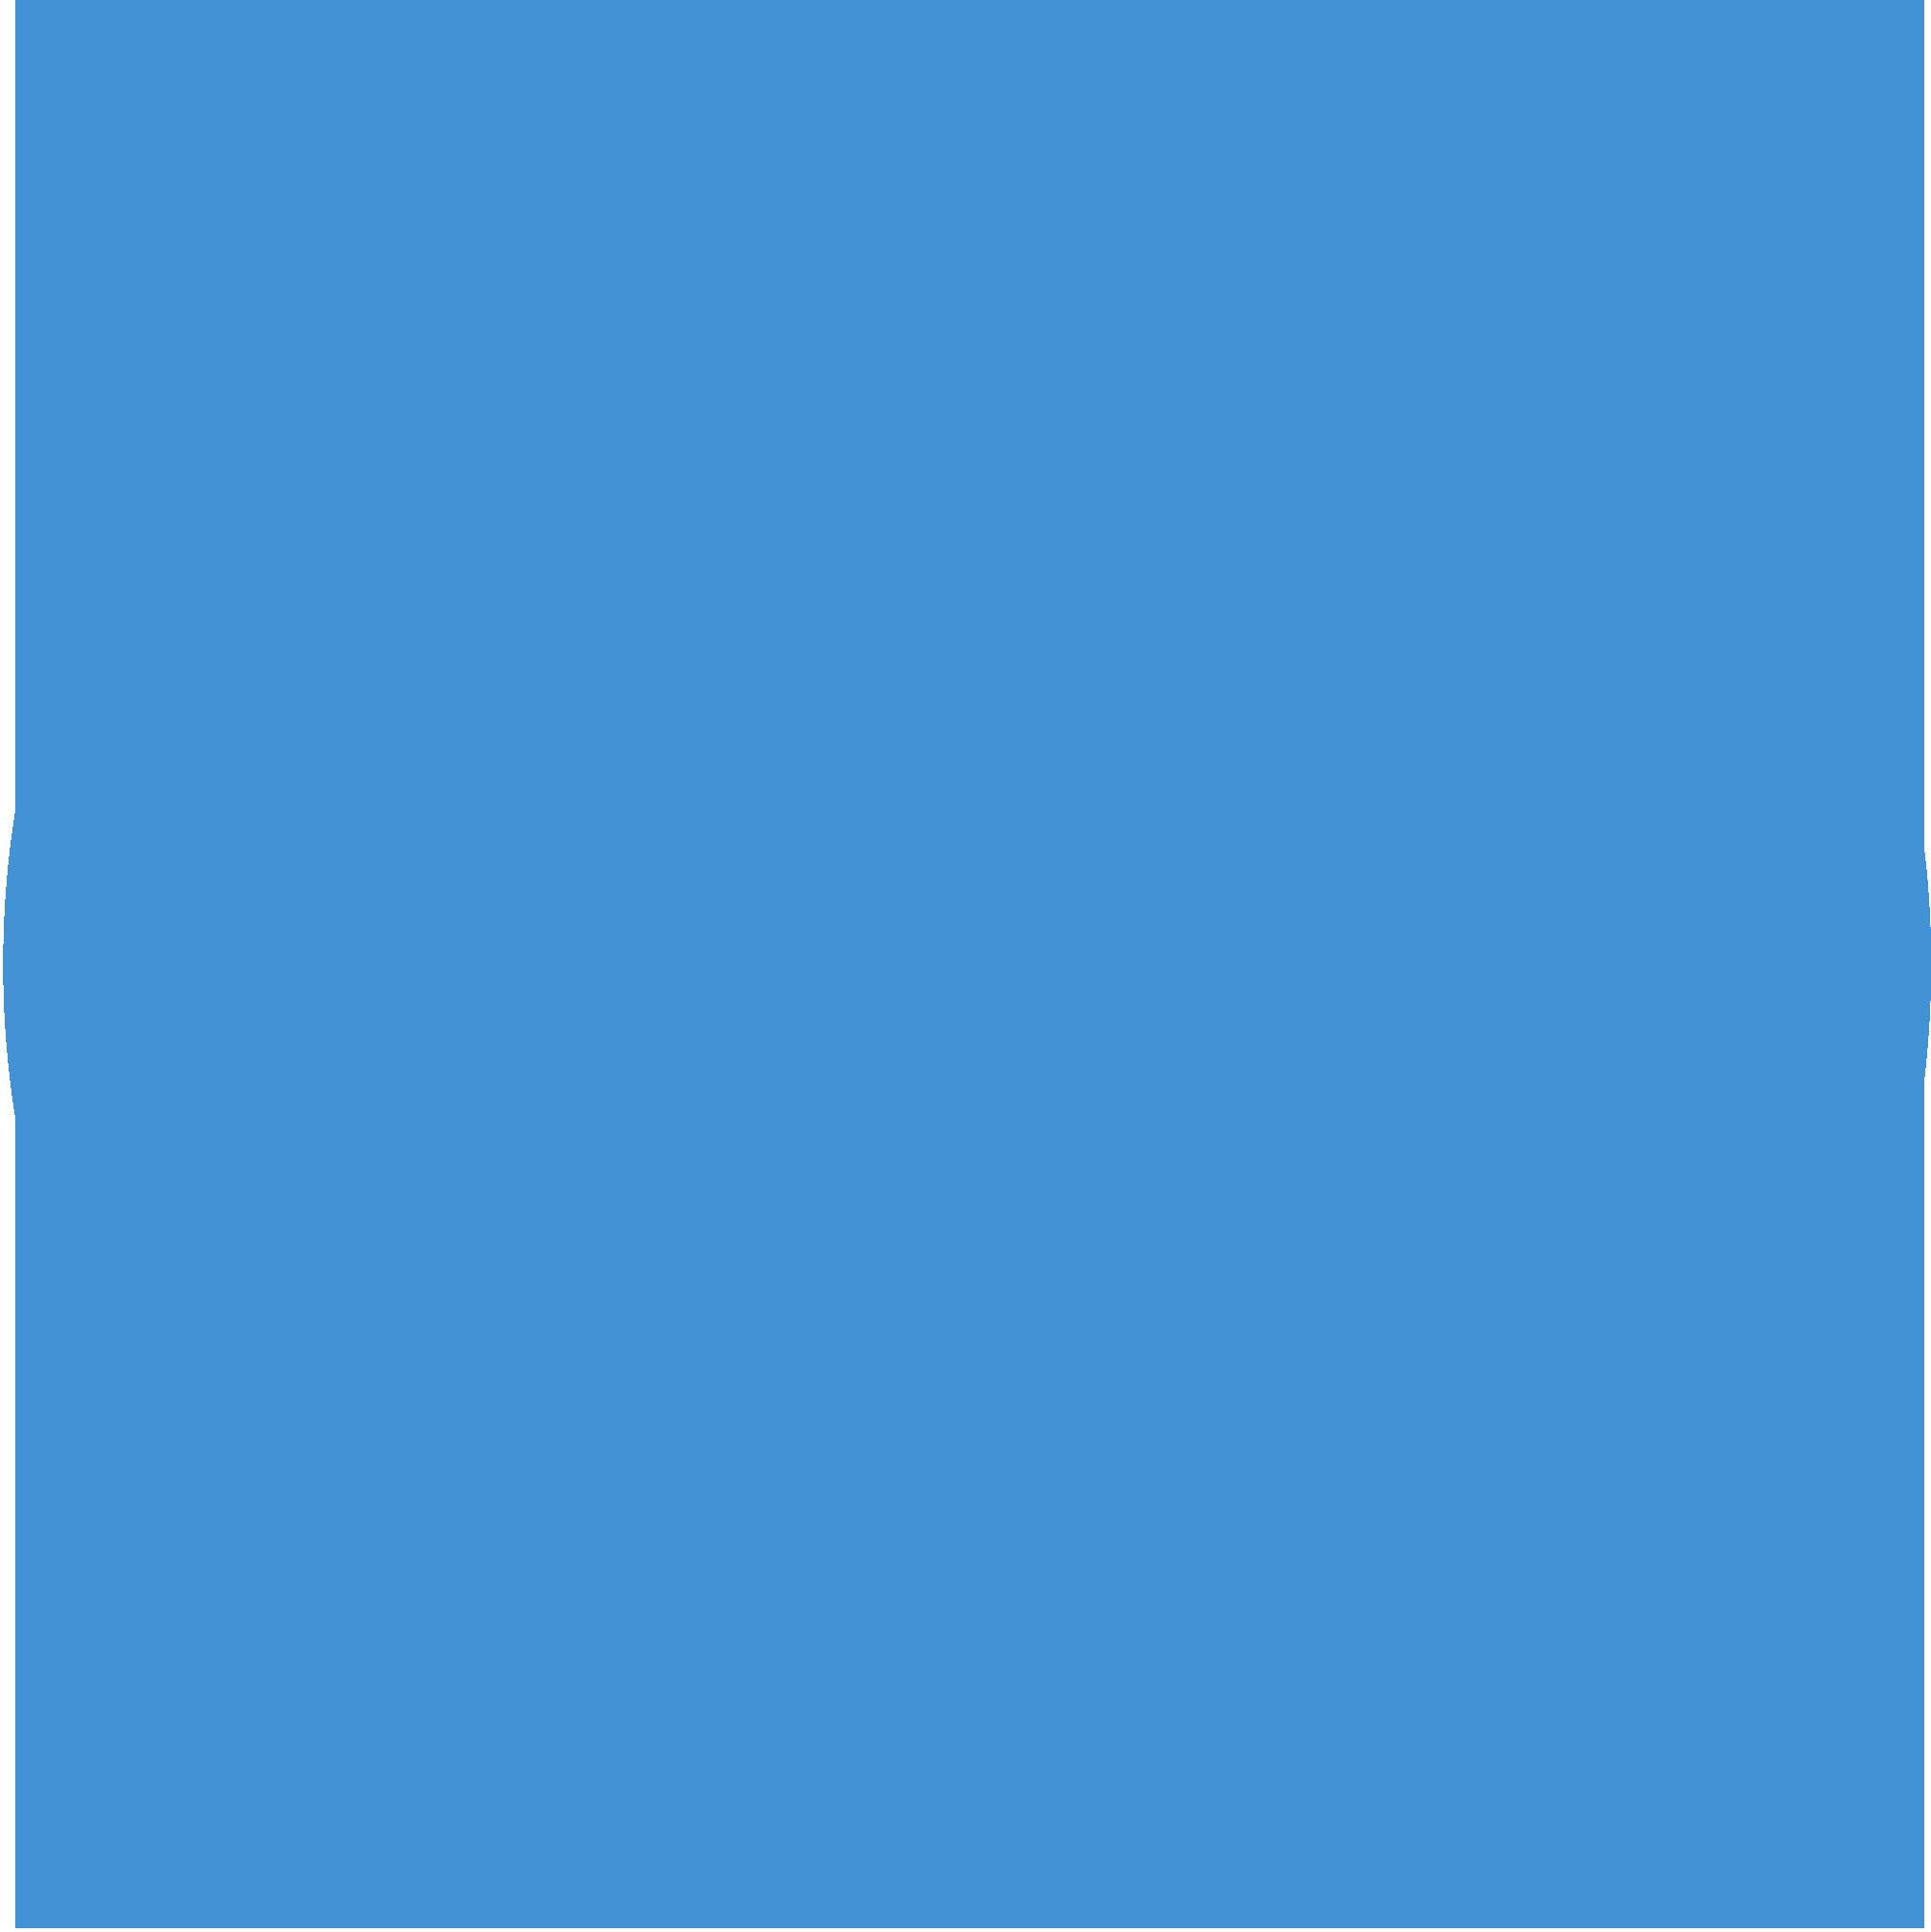 Download PNG Image - Facebook Png Hd 867 - Natural Gas PNG HD